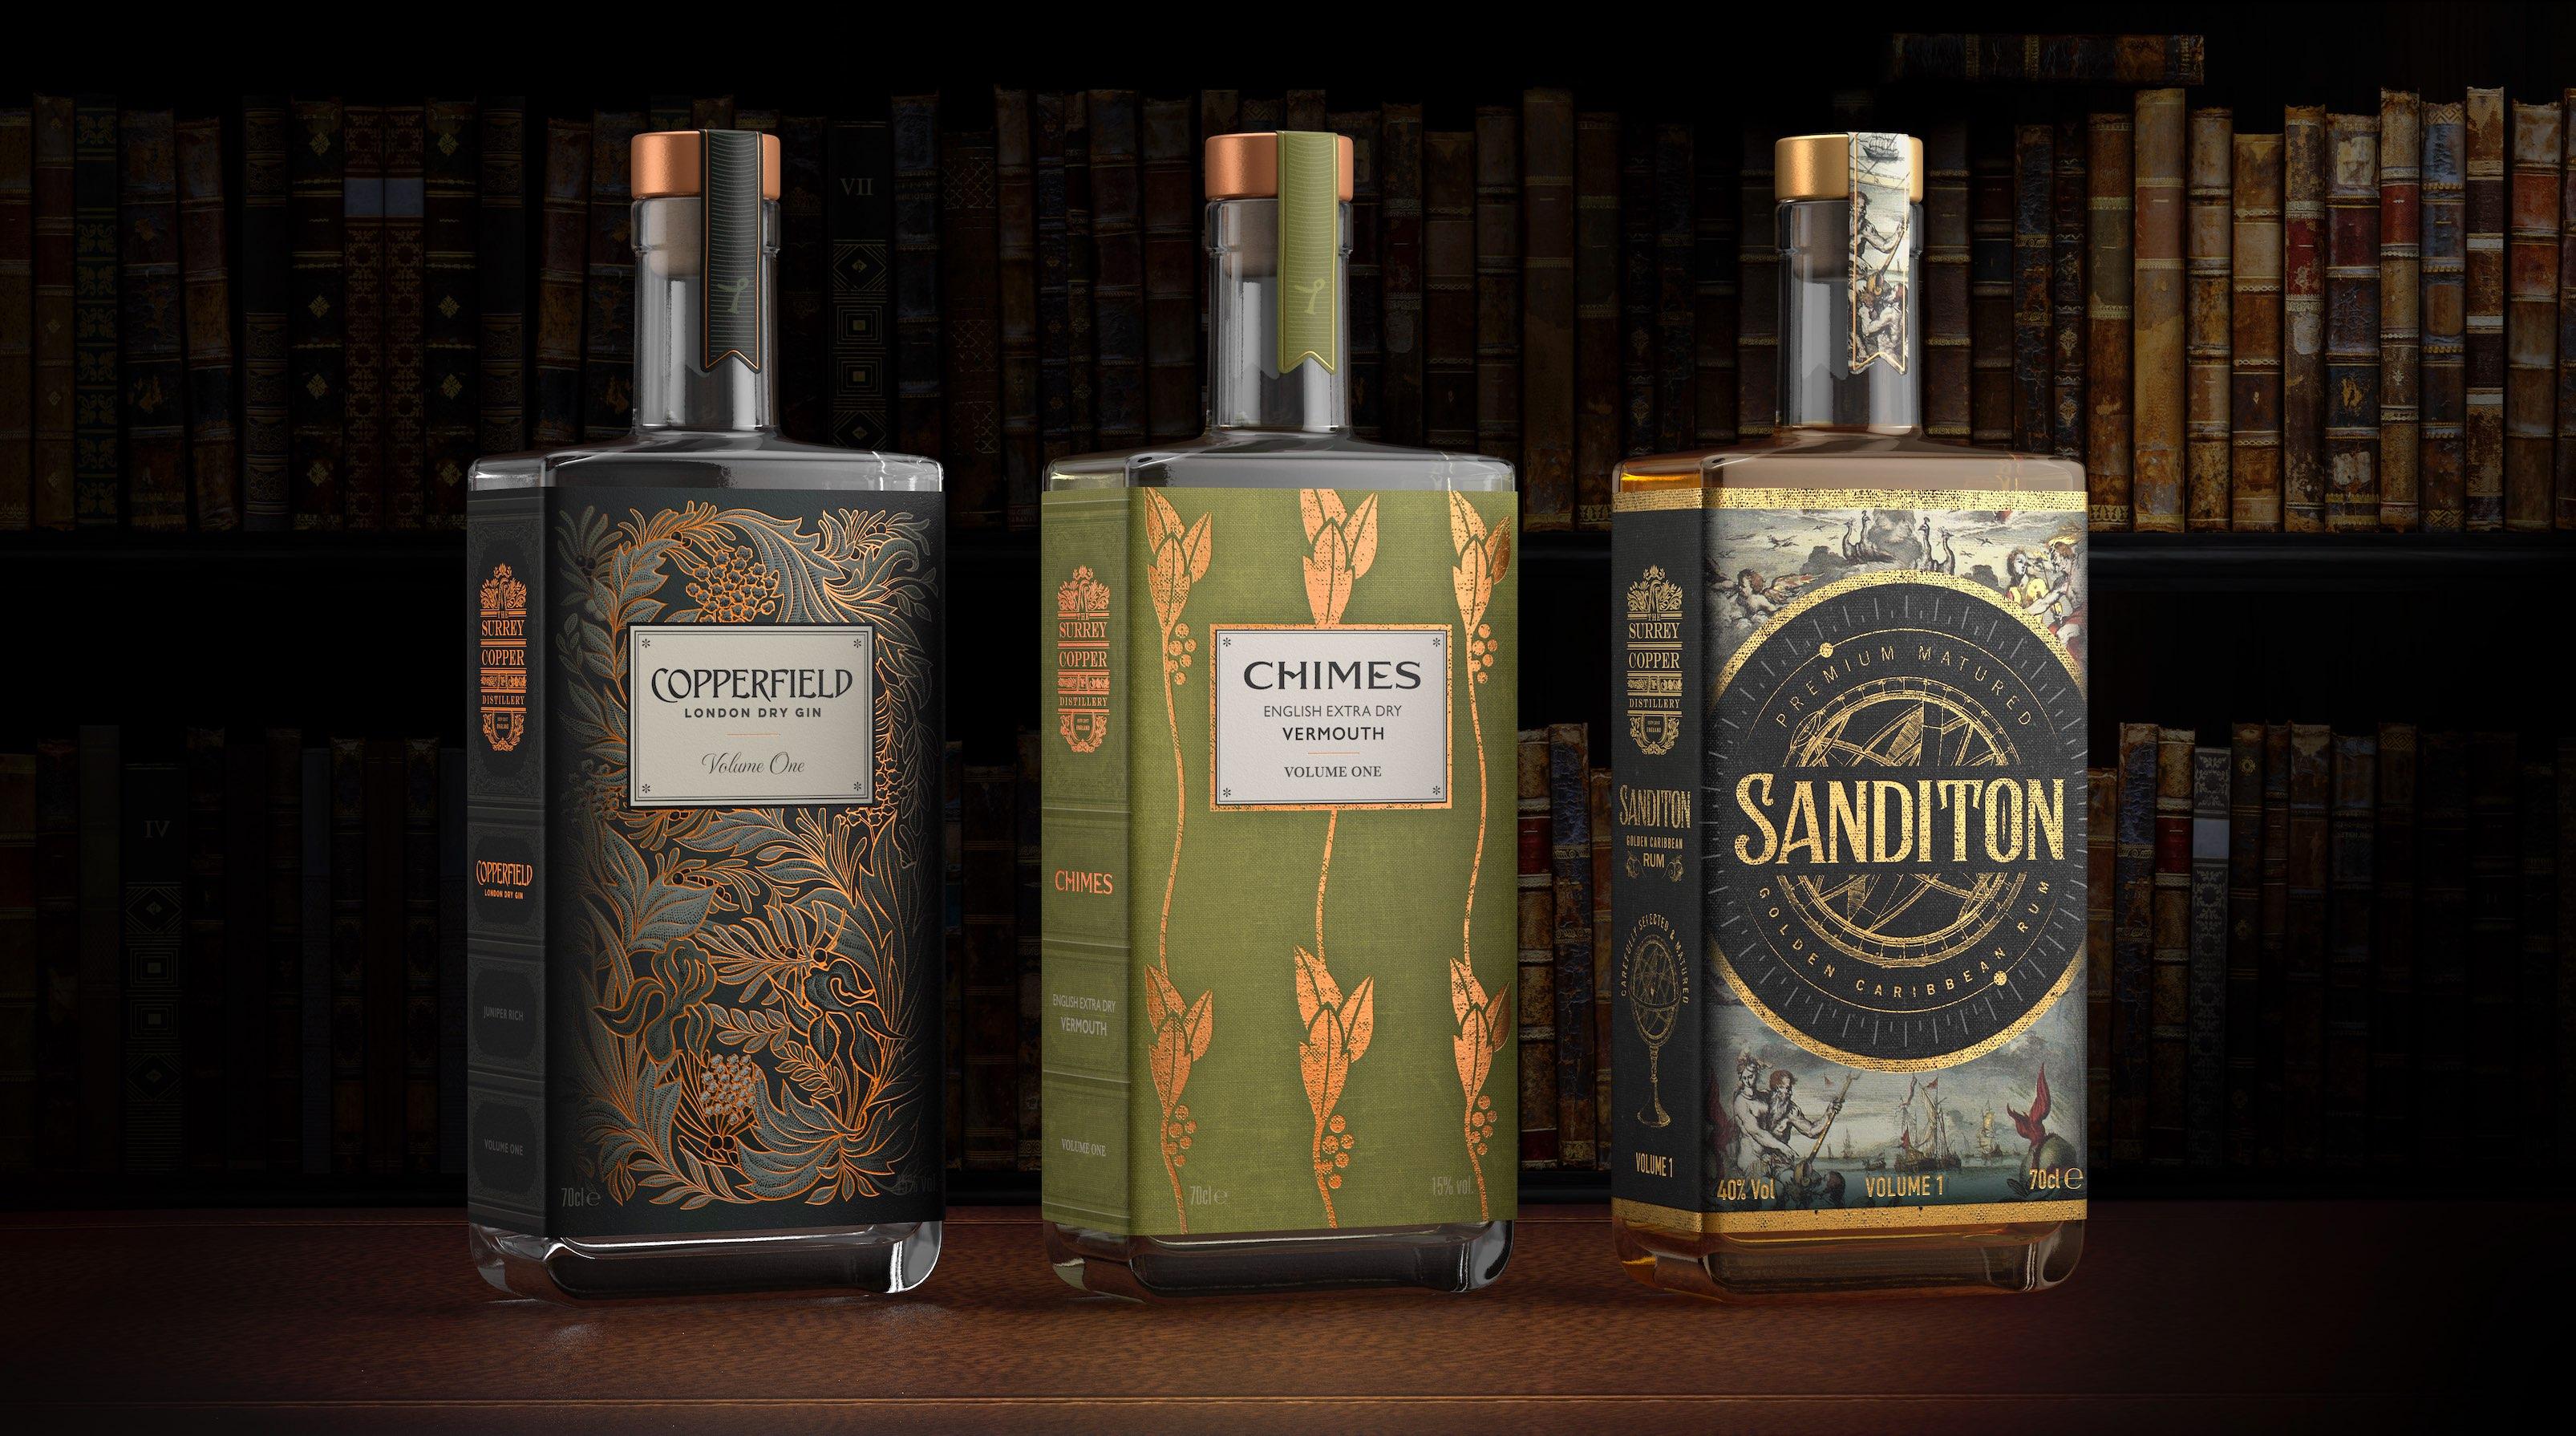 The Surrey Copper Distillery Sanditon Rum Volume 1 by Nude Brand Creation